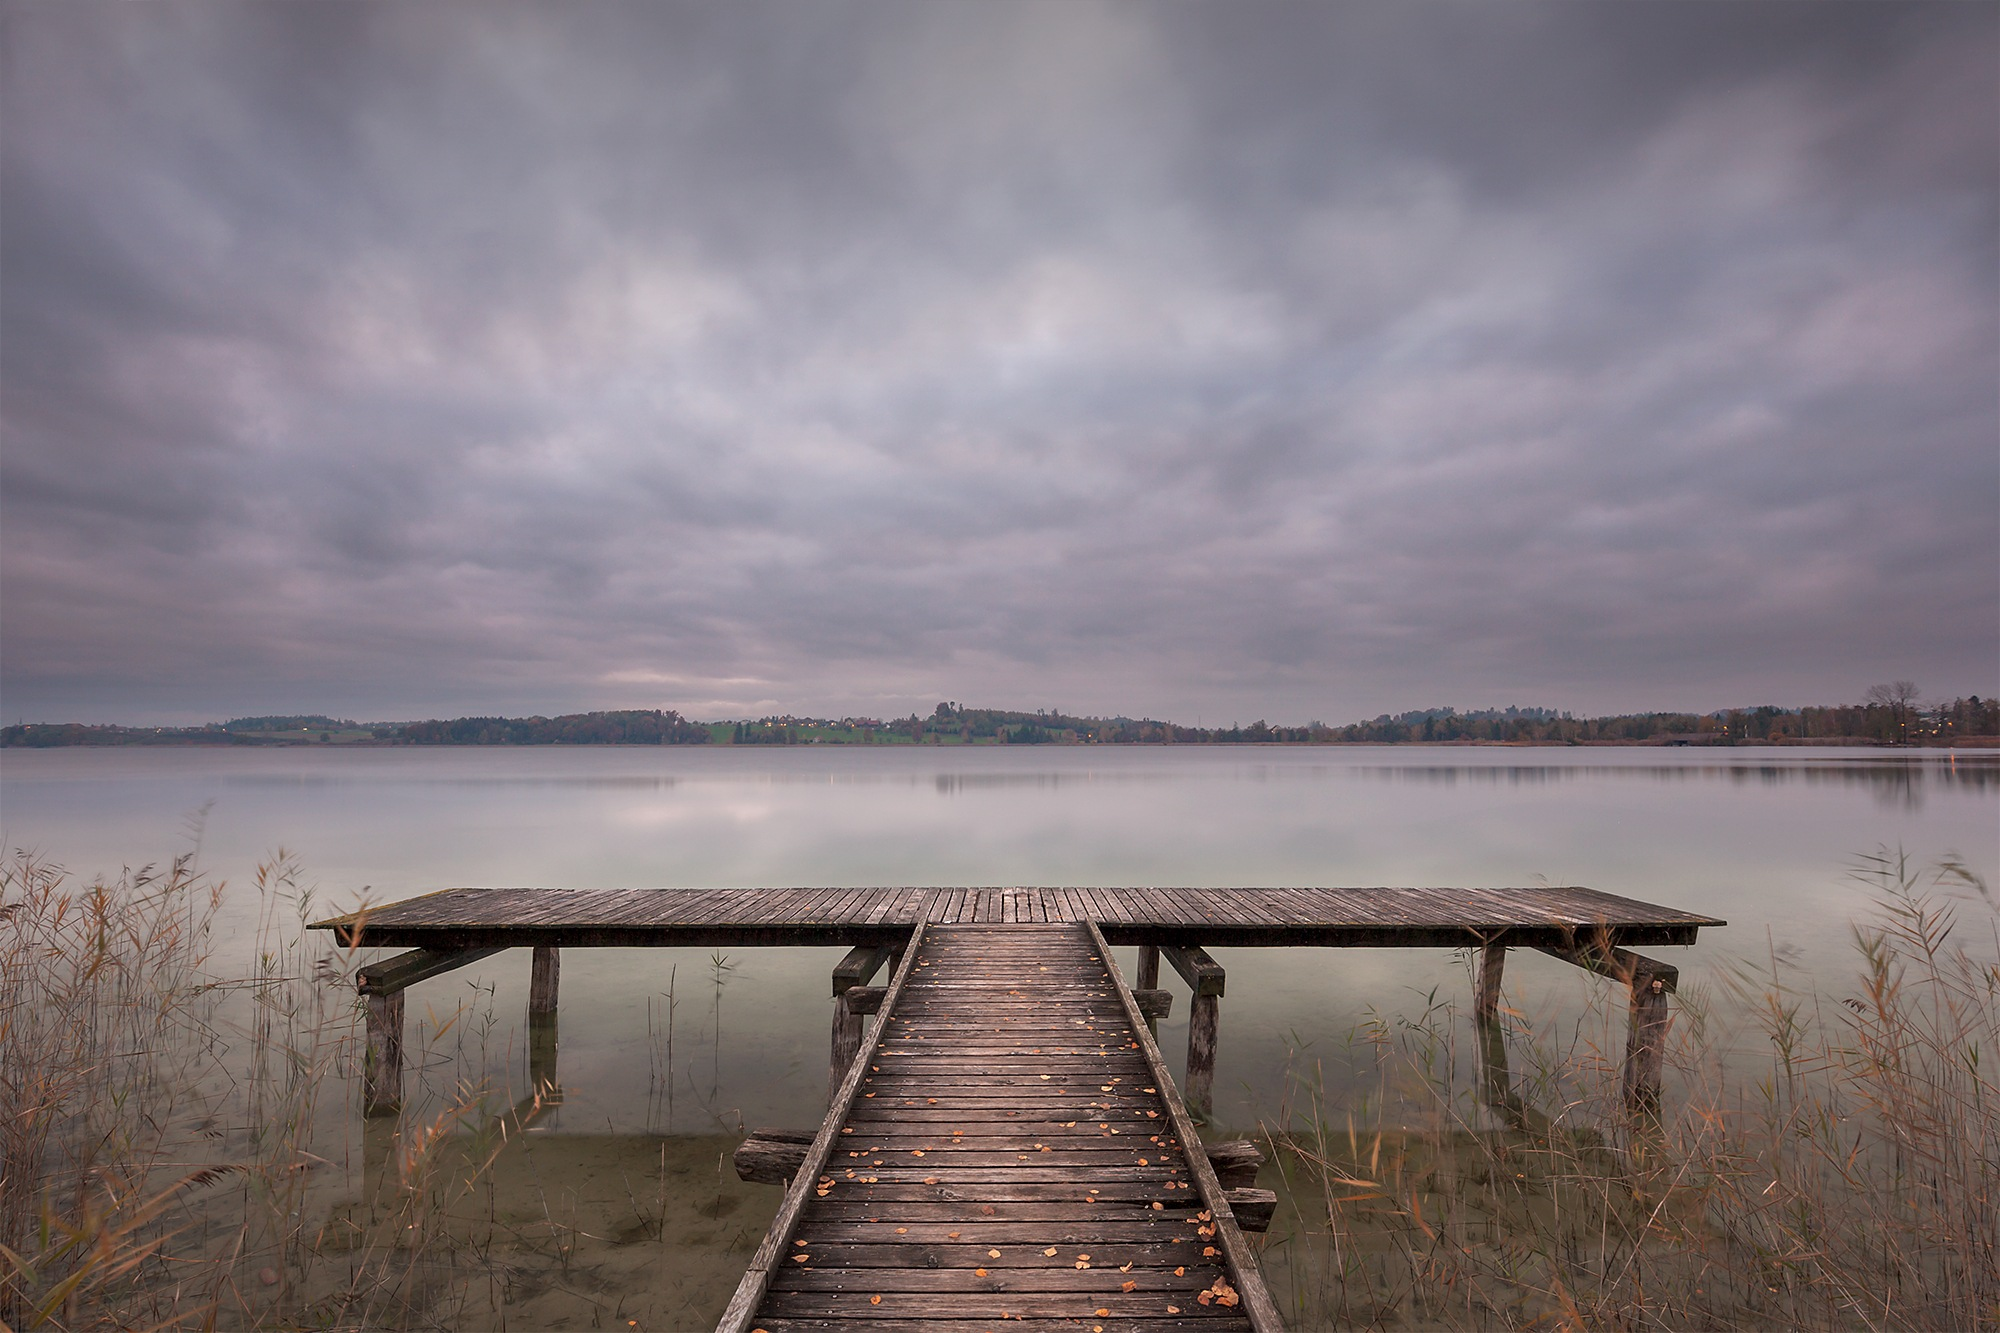 Melancholy by Tamara Tschopp